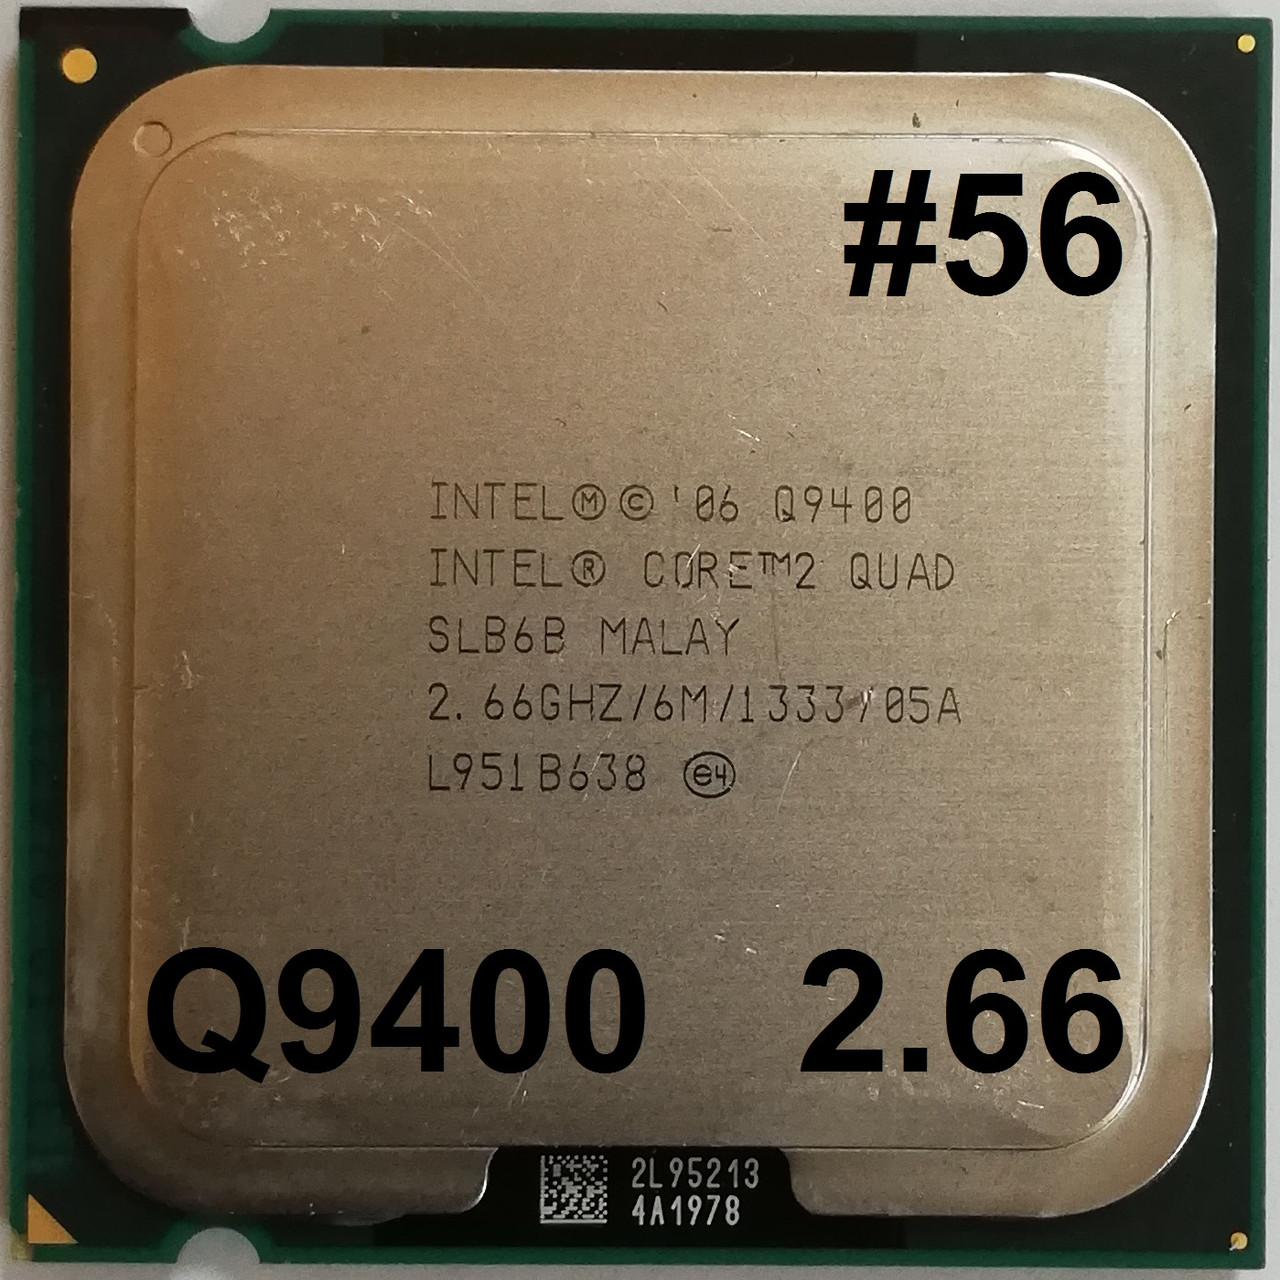 Процессор  ЛОТ #56 Intel® Core™2 Quad Q9400 R0 SLB6B 2.66GHz 6M Cache 1333 MHz FSB Soket 775 Б/У